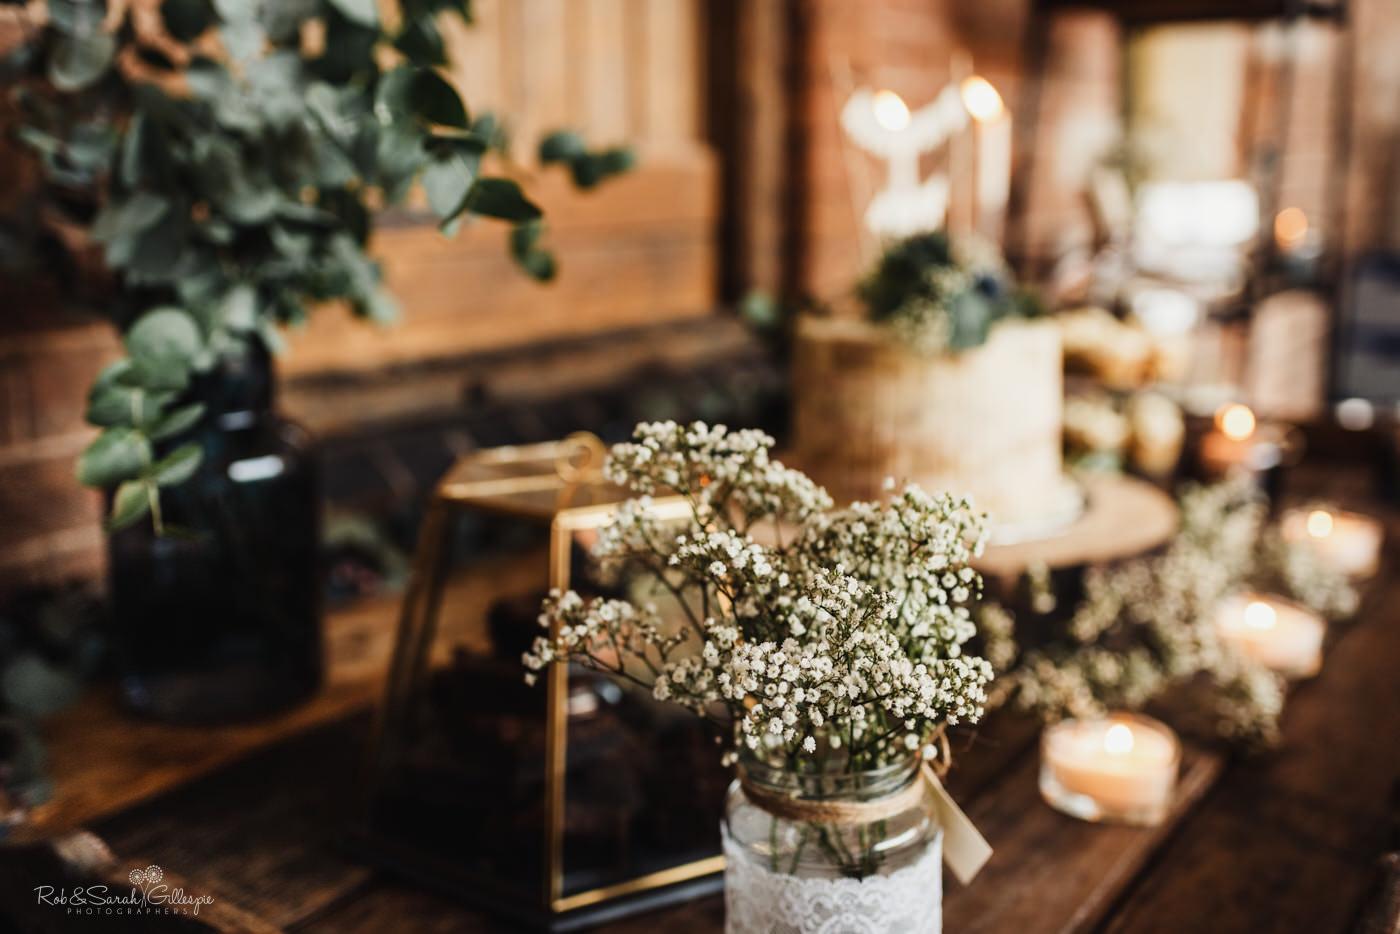 Swallows Nest Barn wedding details